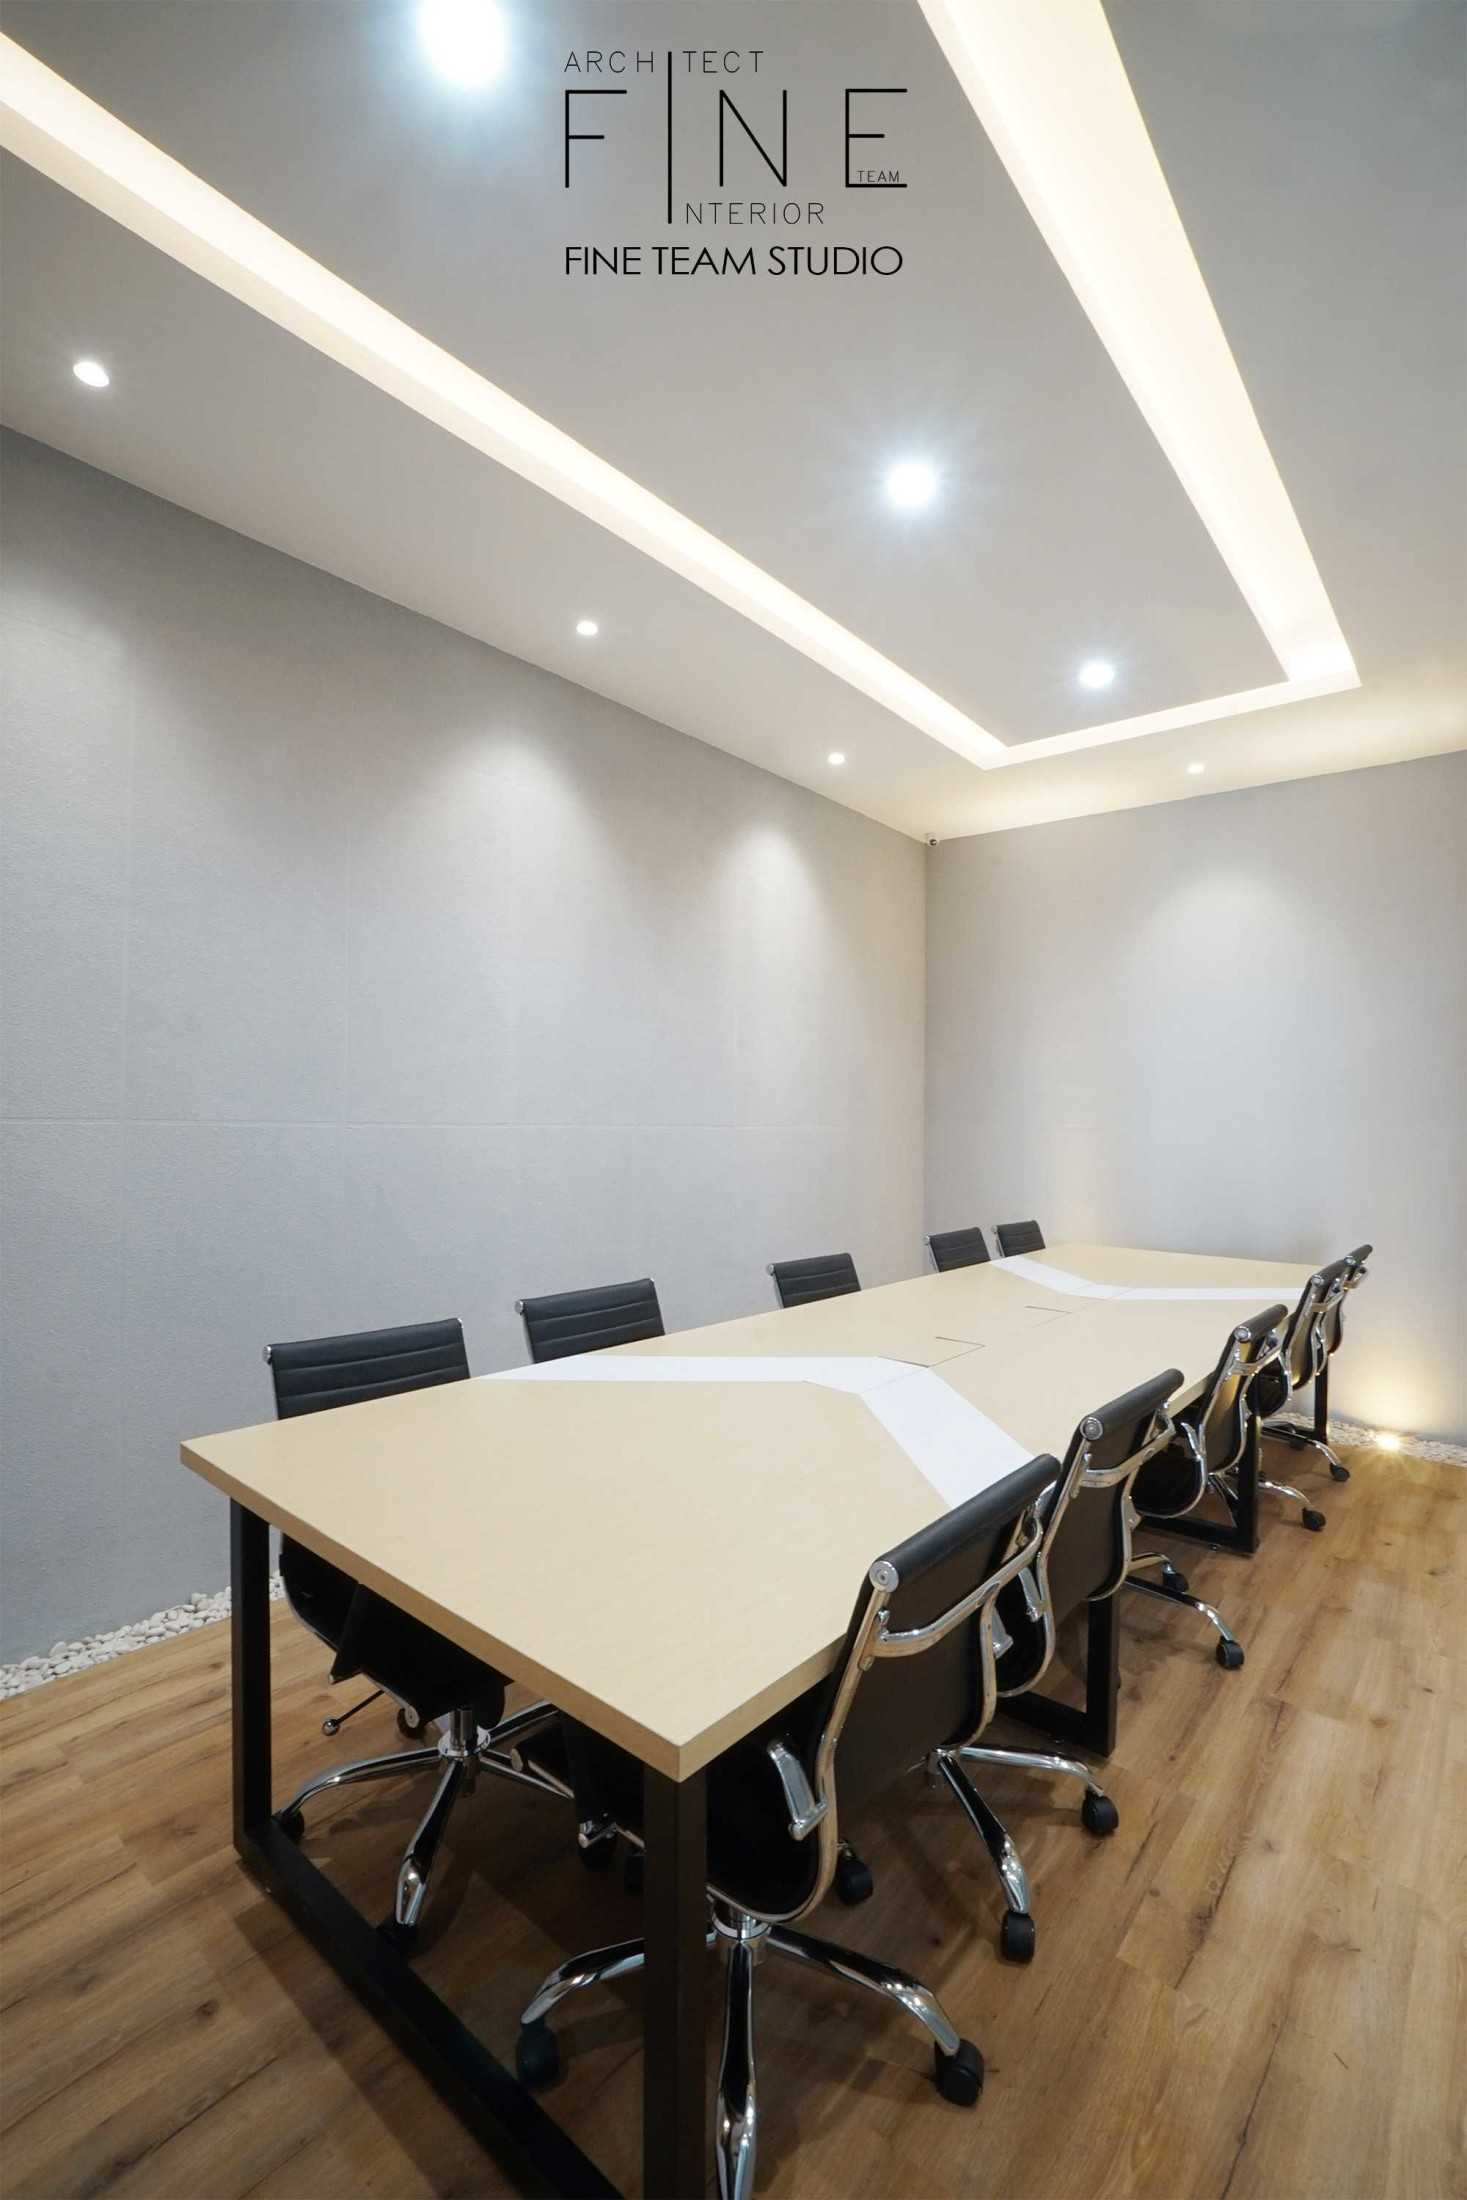 Fine Team Studio Mob Office Cikupa, Tangerang, Banten, Indonesia Cikupa, Tangerang, Banten, Indonesia Fine-Team-Studio-Mob-Office  71147